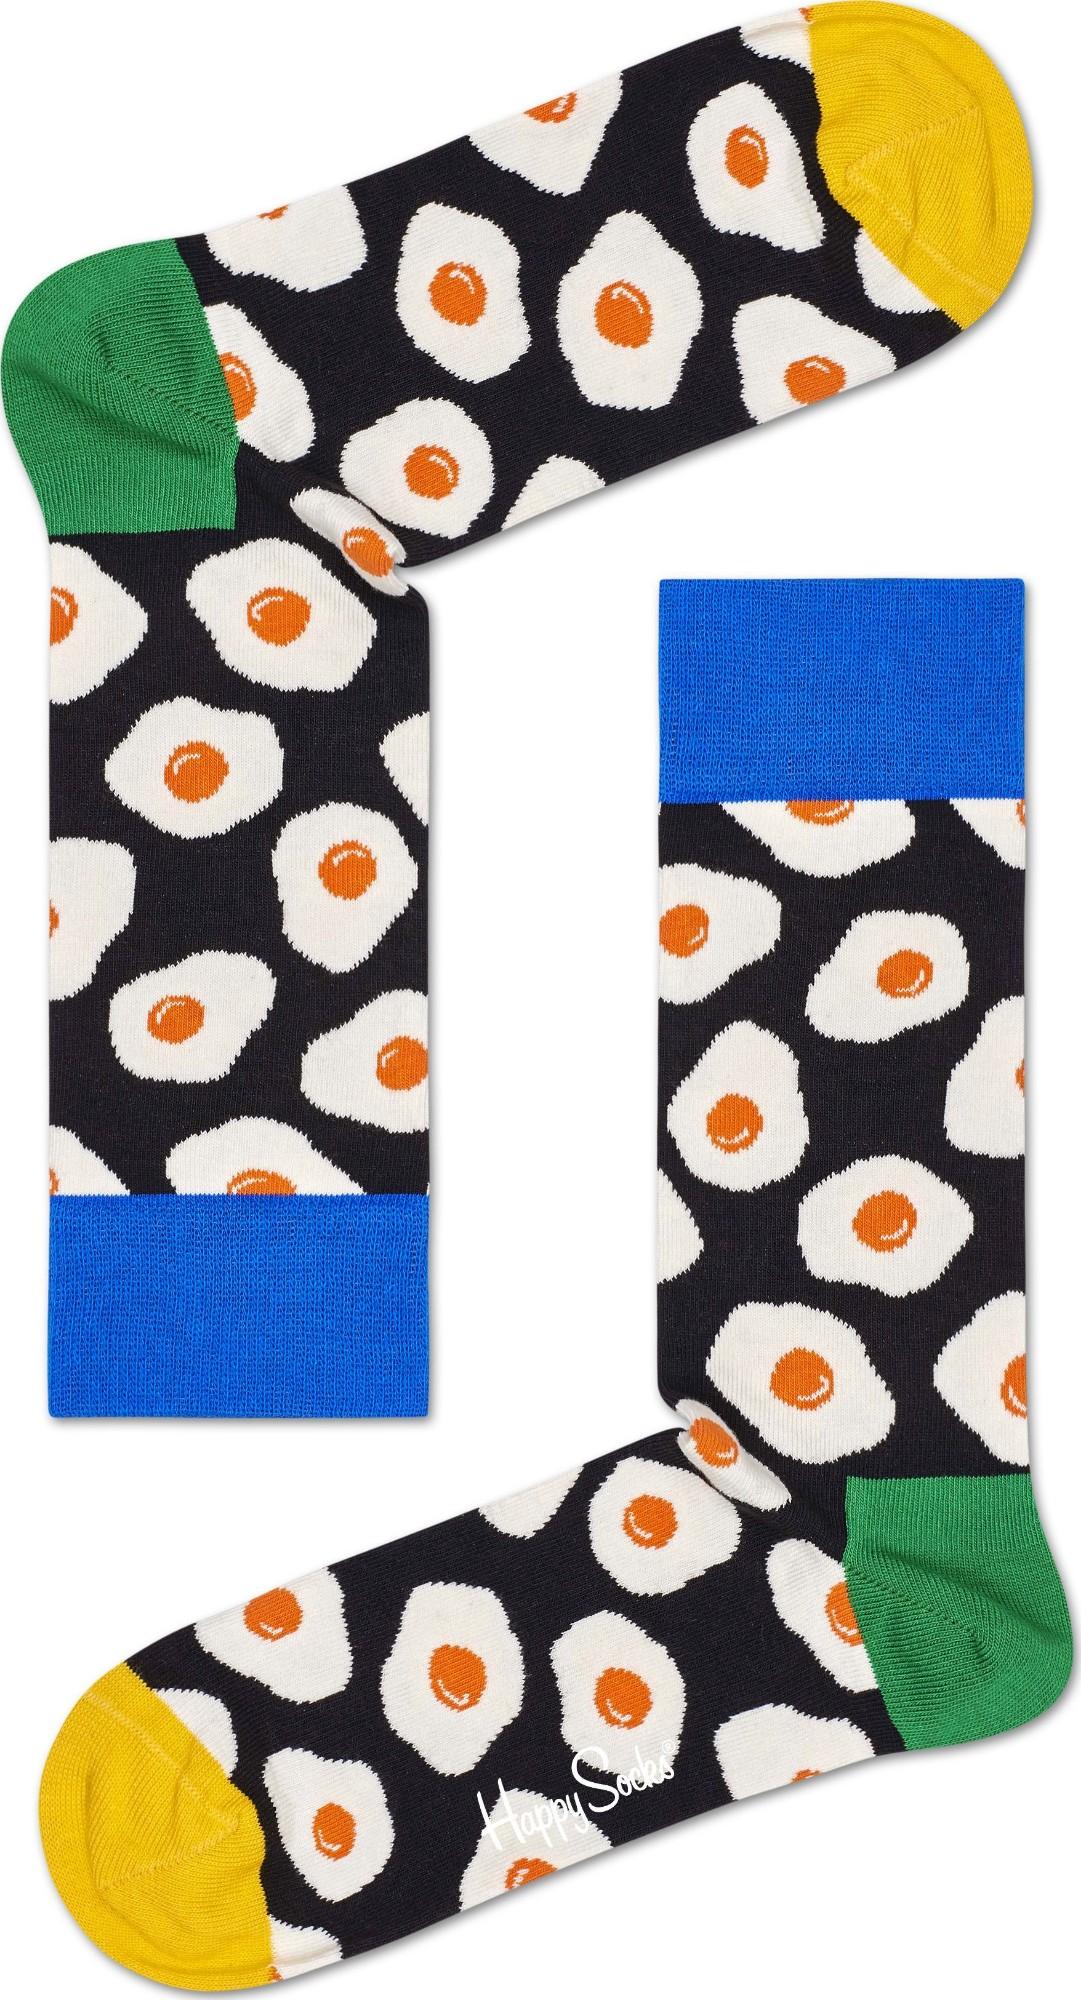 Happy Socks Sunny Side Up Multi 9300 41-46